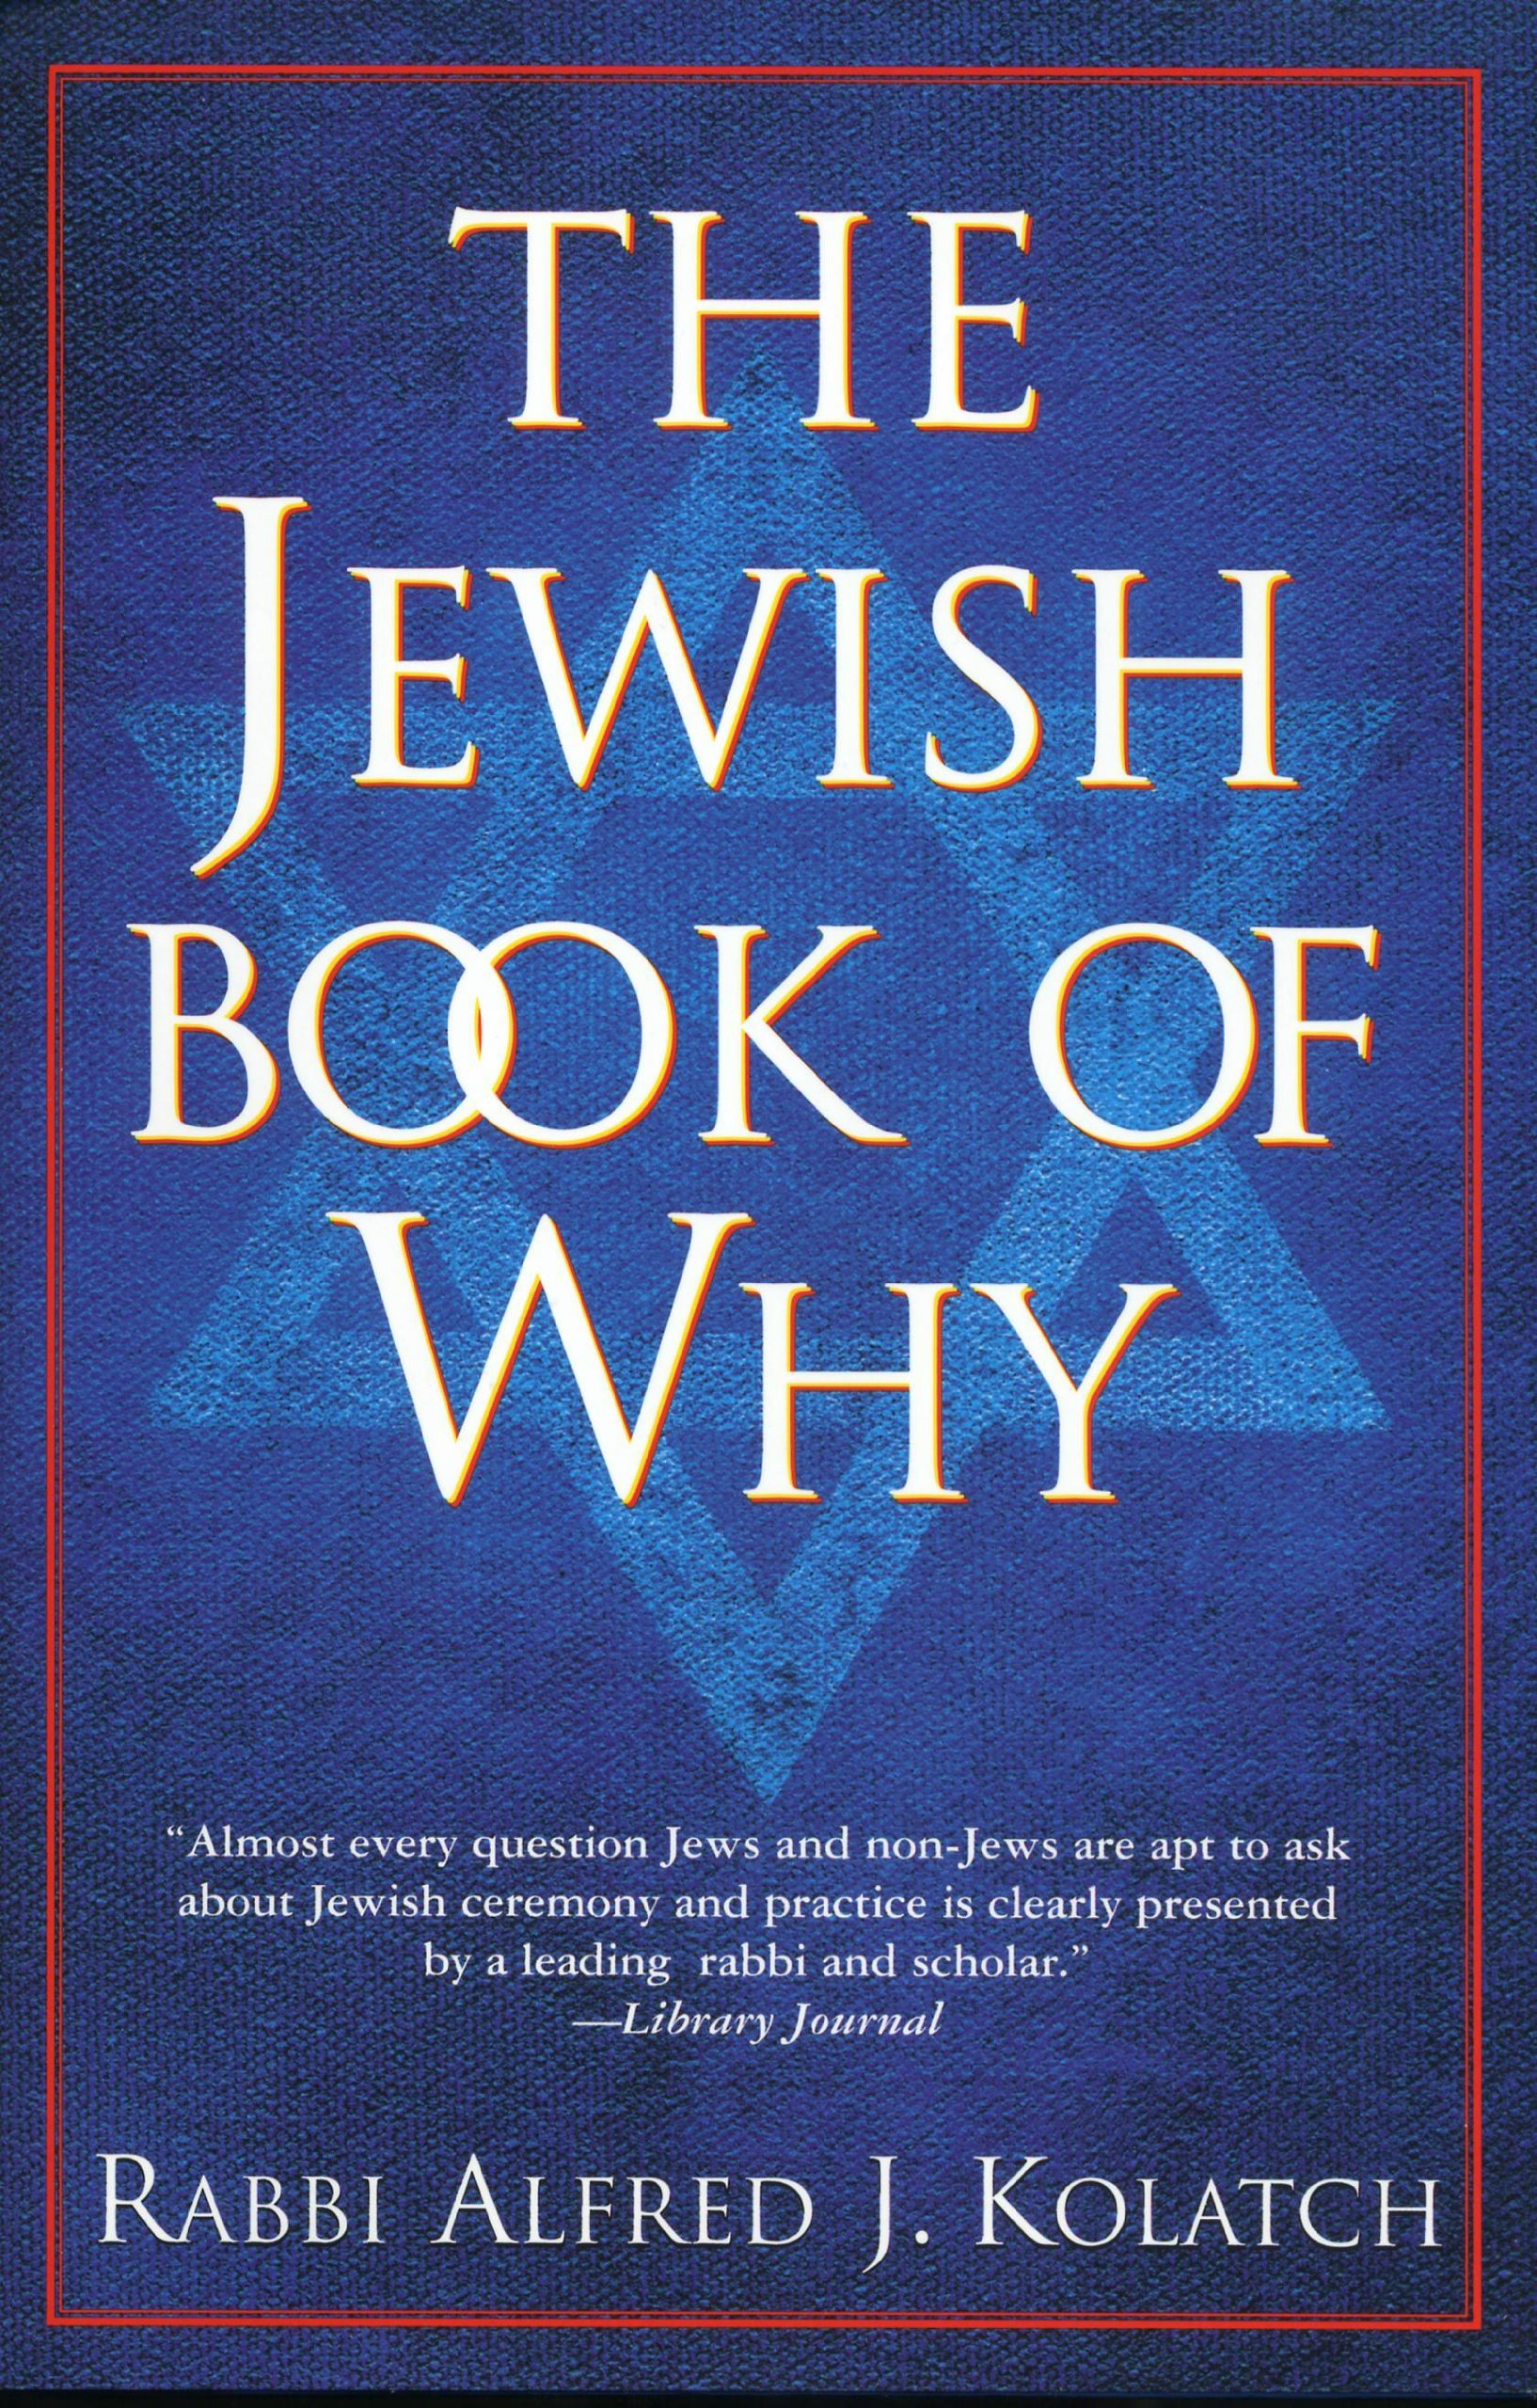 Jewish Book of Why: Amazon.co.uk: Alfred J. Kolatch: 9780824602567: Books